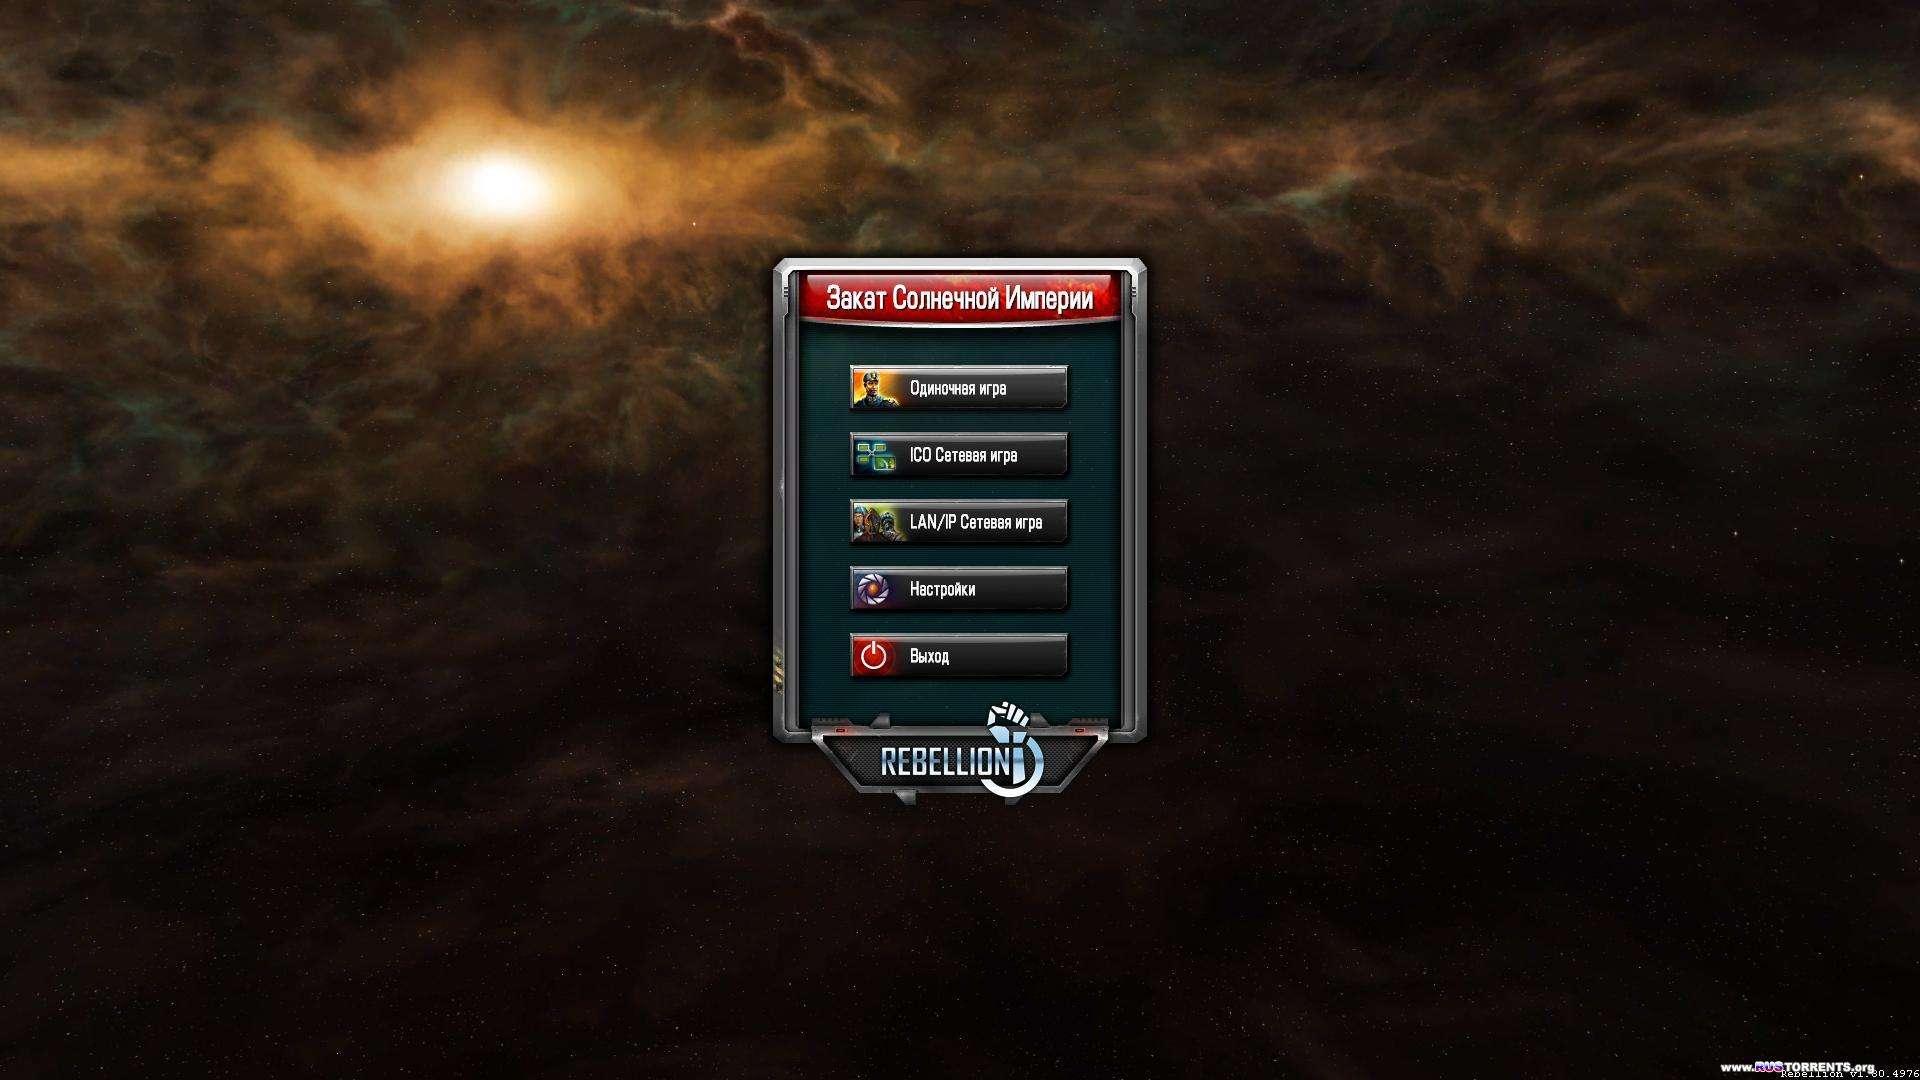 Sins of a Solar Empire: Rebellion [v 1.80 + 2 DLC] | PC |  Repack от Fenixx